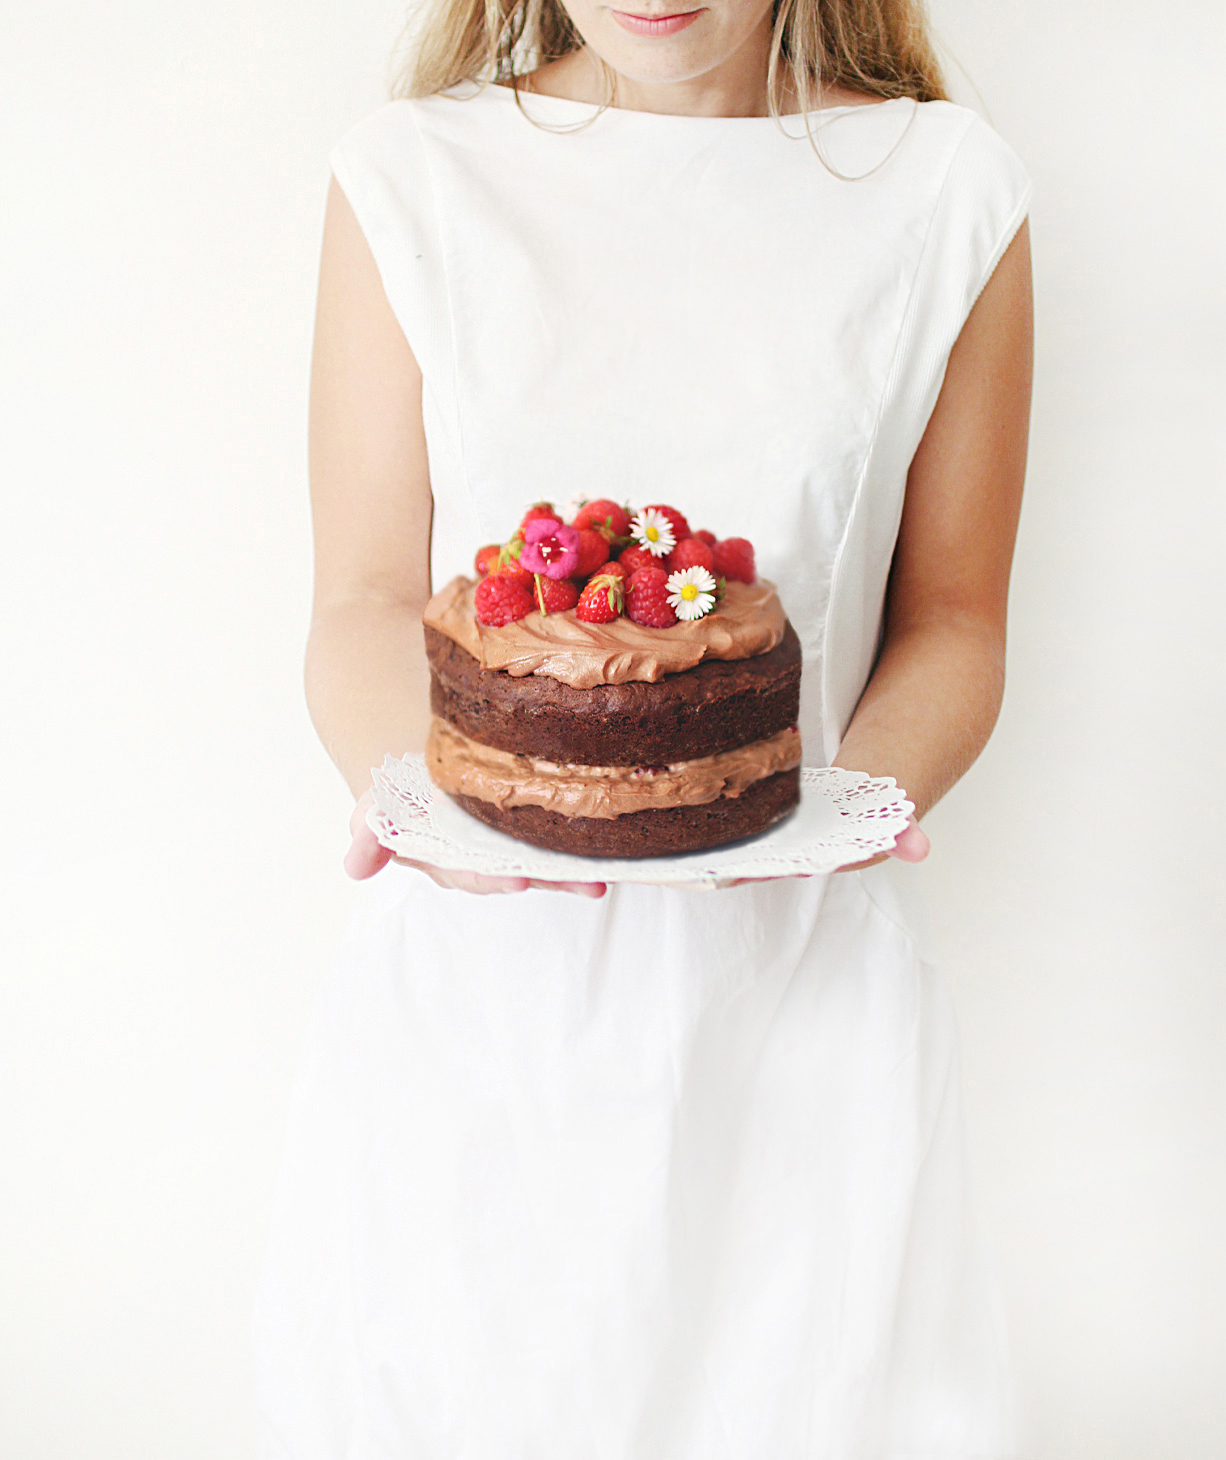 gateau chocolat royal chill blog cuisine linda lomelino fin2